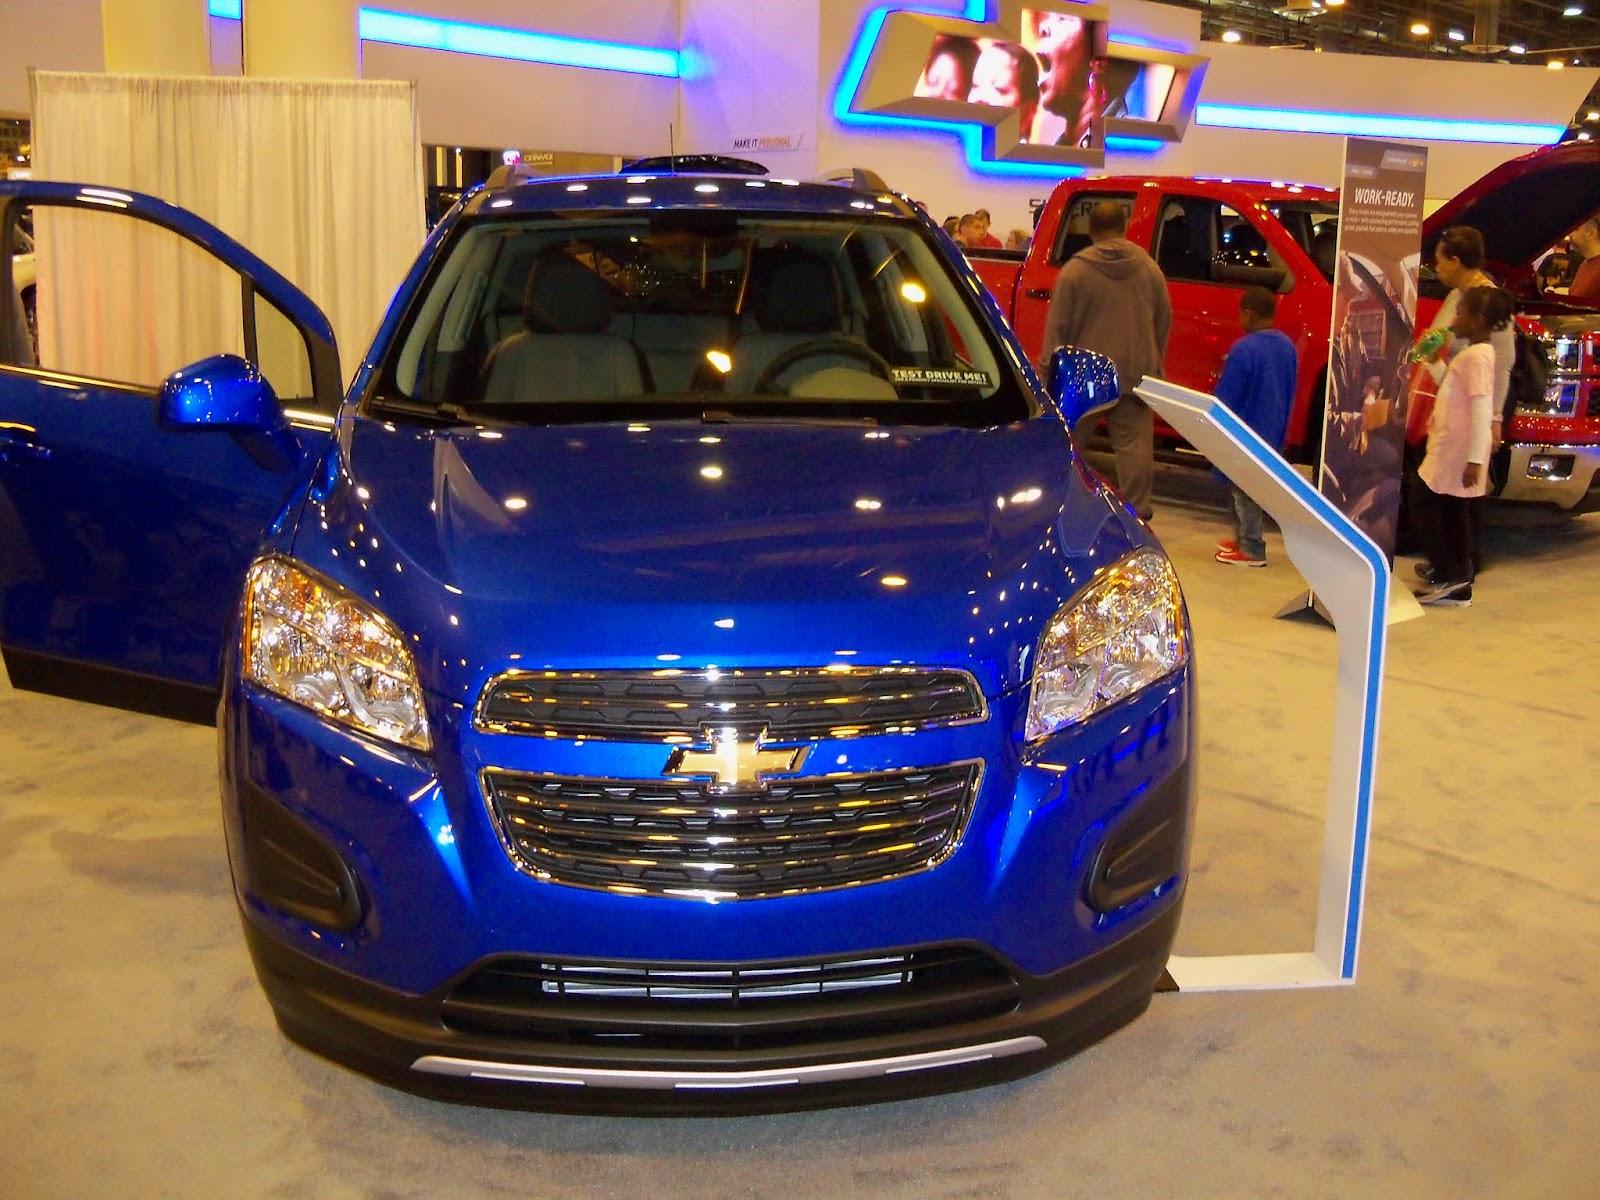 Houston Auto Show 2015 - 116_7293.JPG